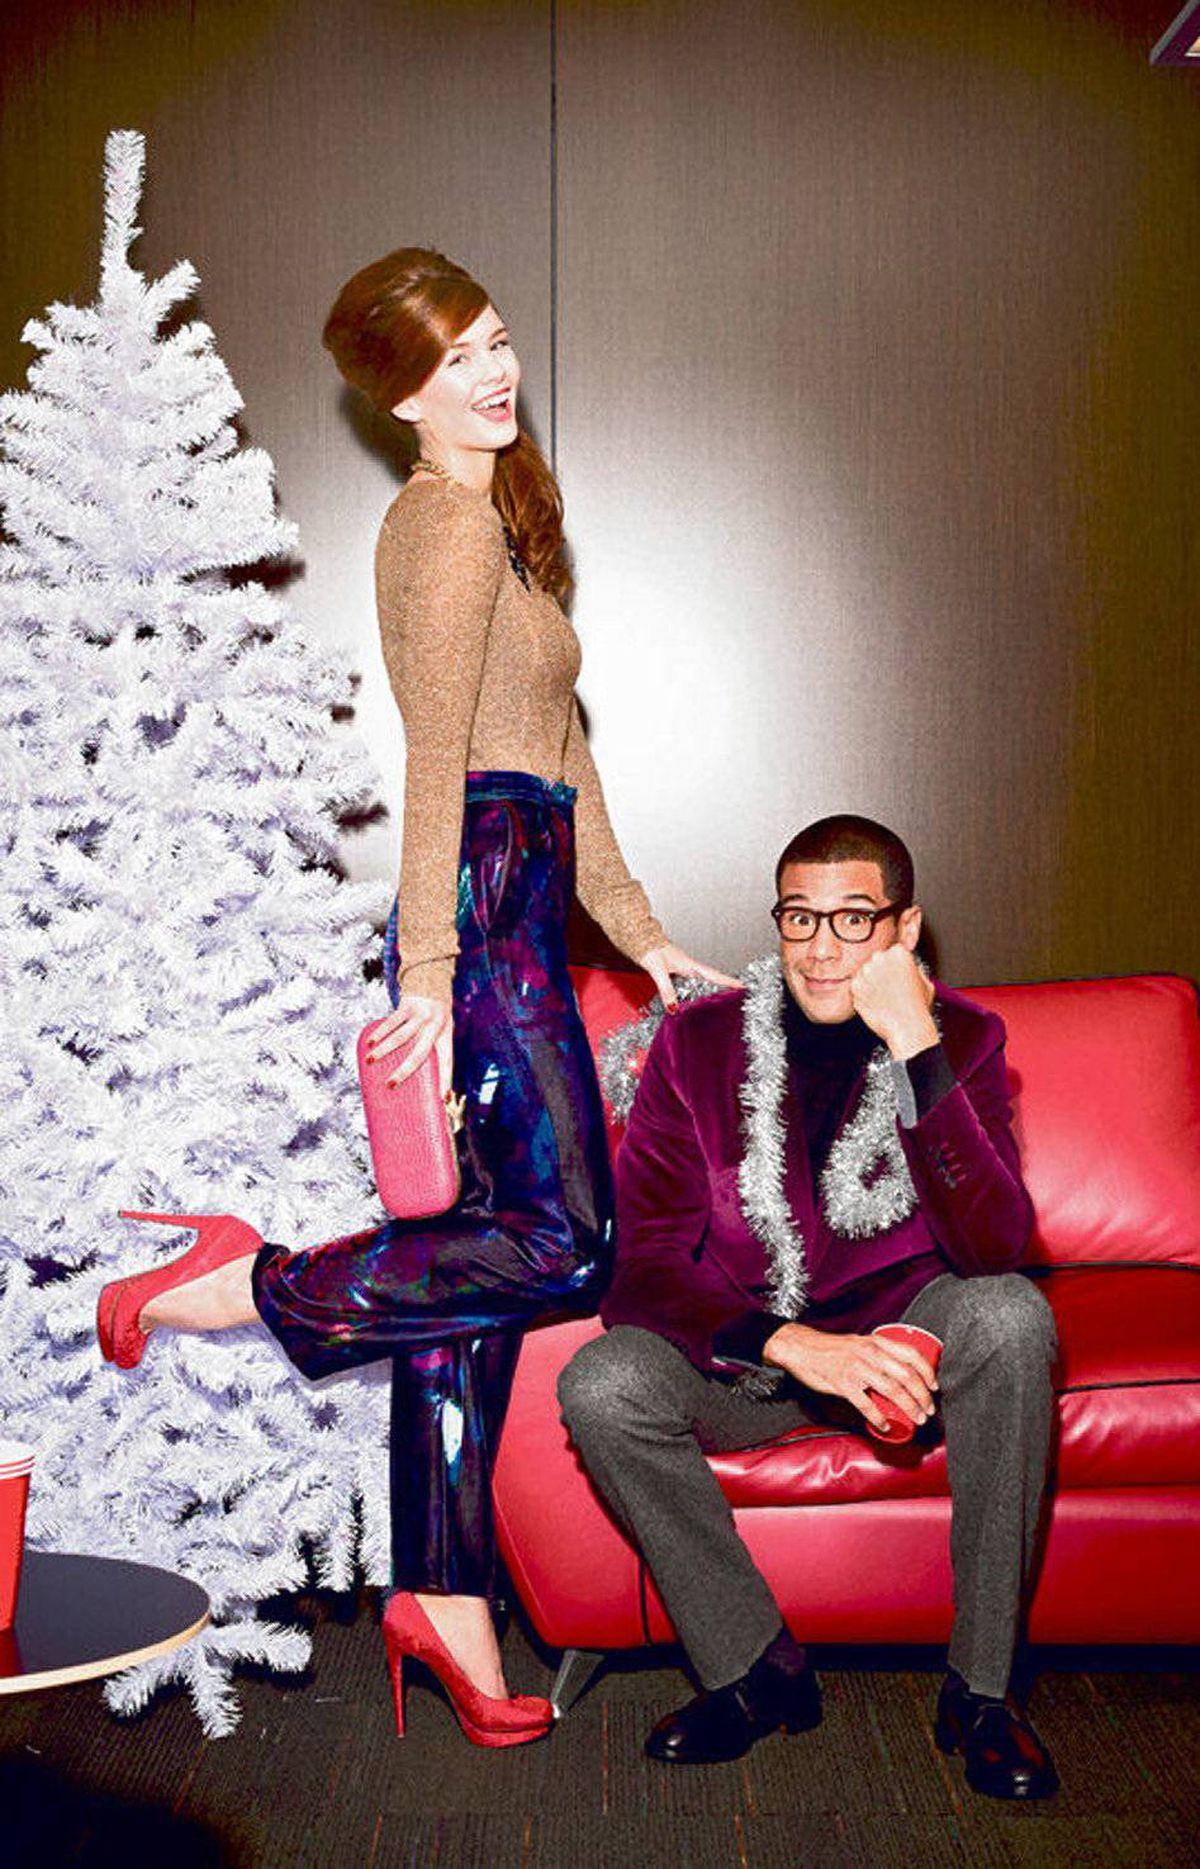 Add some luxe, like velvet. WHERE TO BUY: Her: Marc by Marc Jacobs top, $210 at Holt Renfrew. Erdem pants, $1,295, Nicholas Kirkwood for Erdem shoes, $895 at The Room. Him: Paul Smith turtleneck, $250, jacket, $695, pants, $365 at Holt Renfrew. Allen Edmonds shoes, $795 at Harry Rosen.